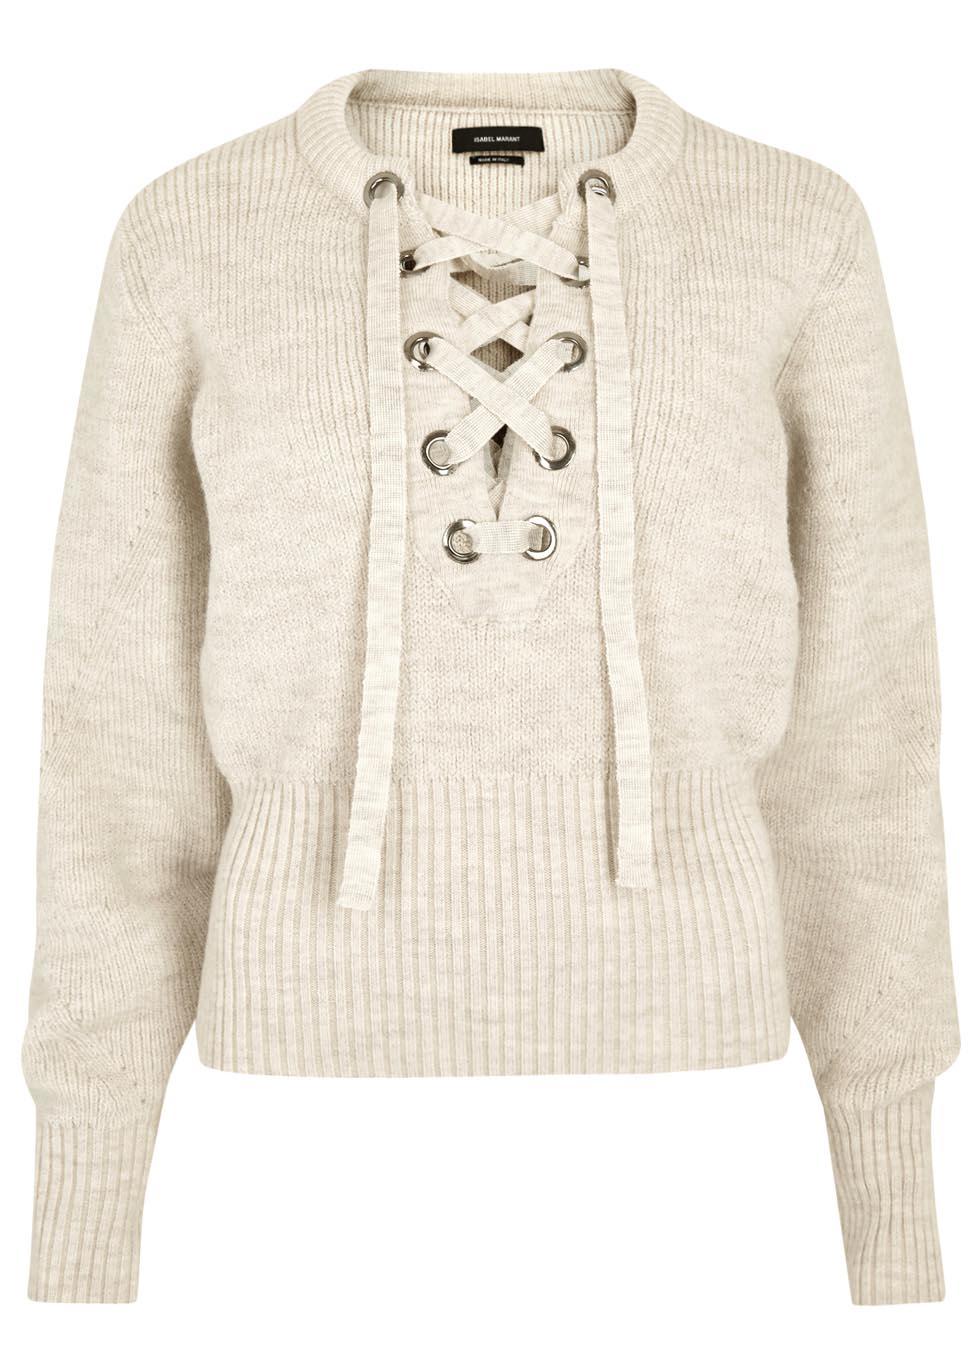 c48f70c04f Isabel Marant Charley Ecru Lace-up Wool Blend Jumper in Natural - Lyst